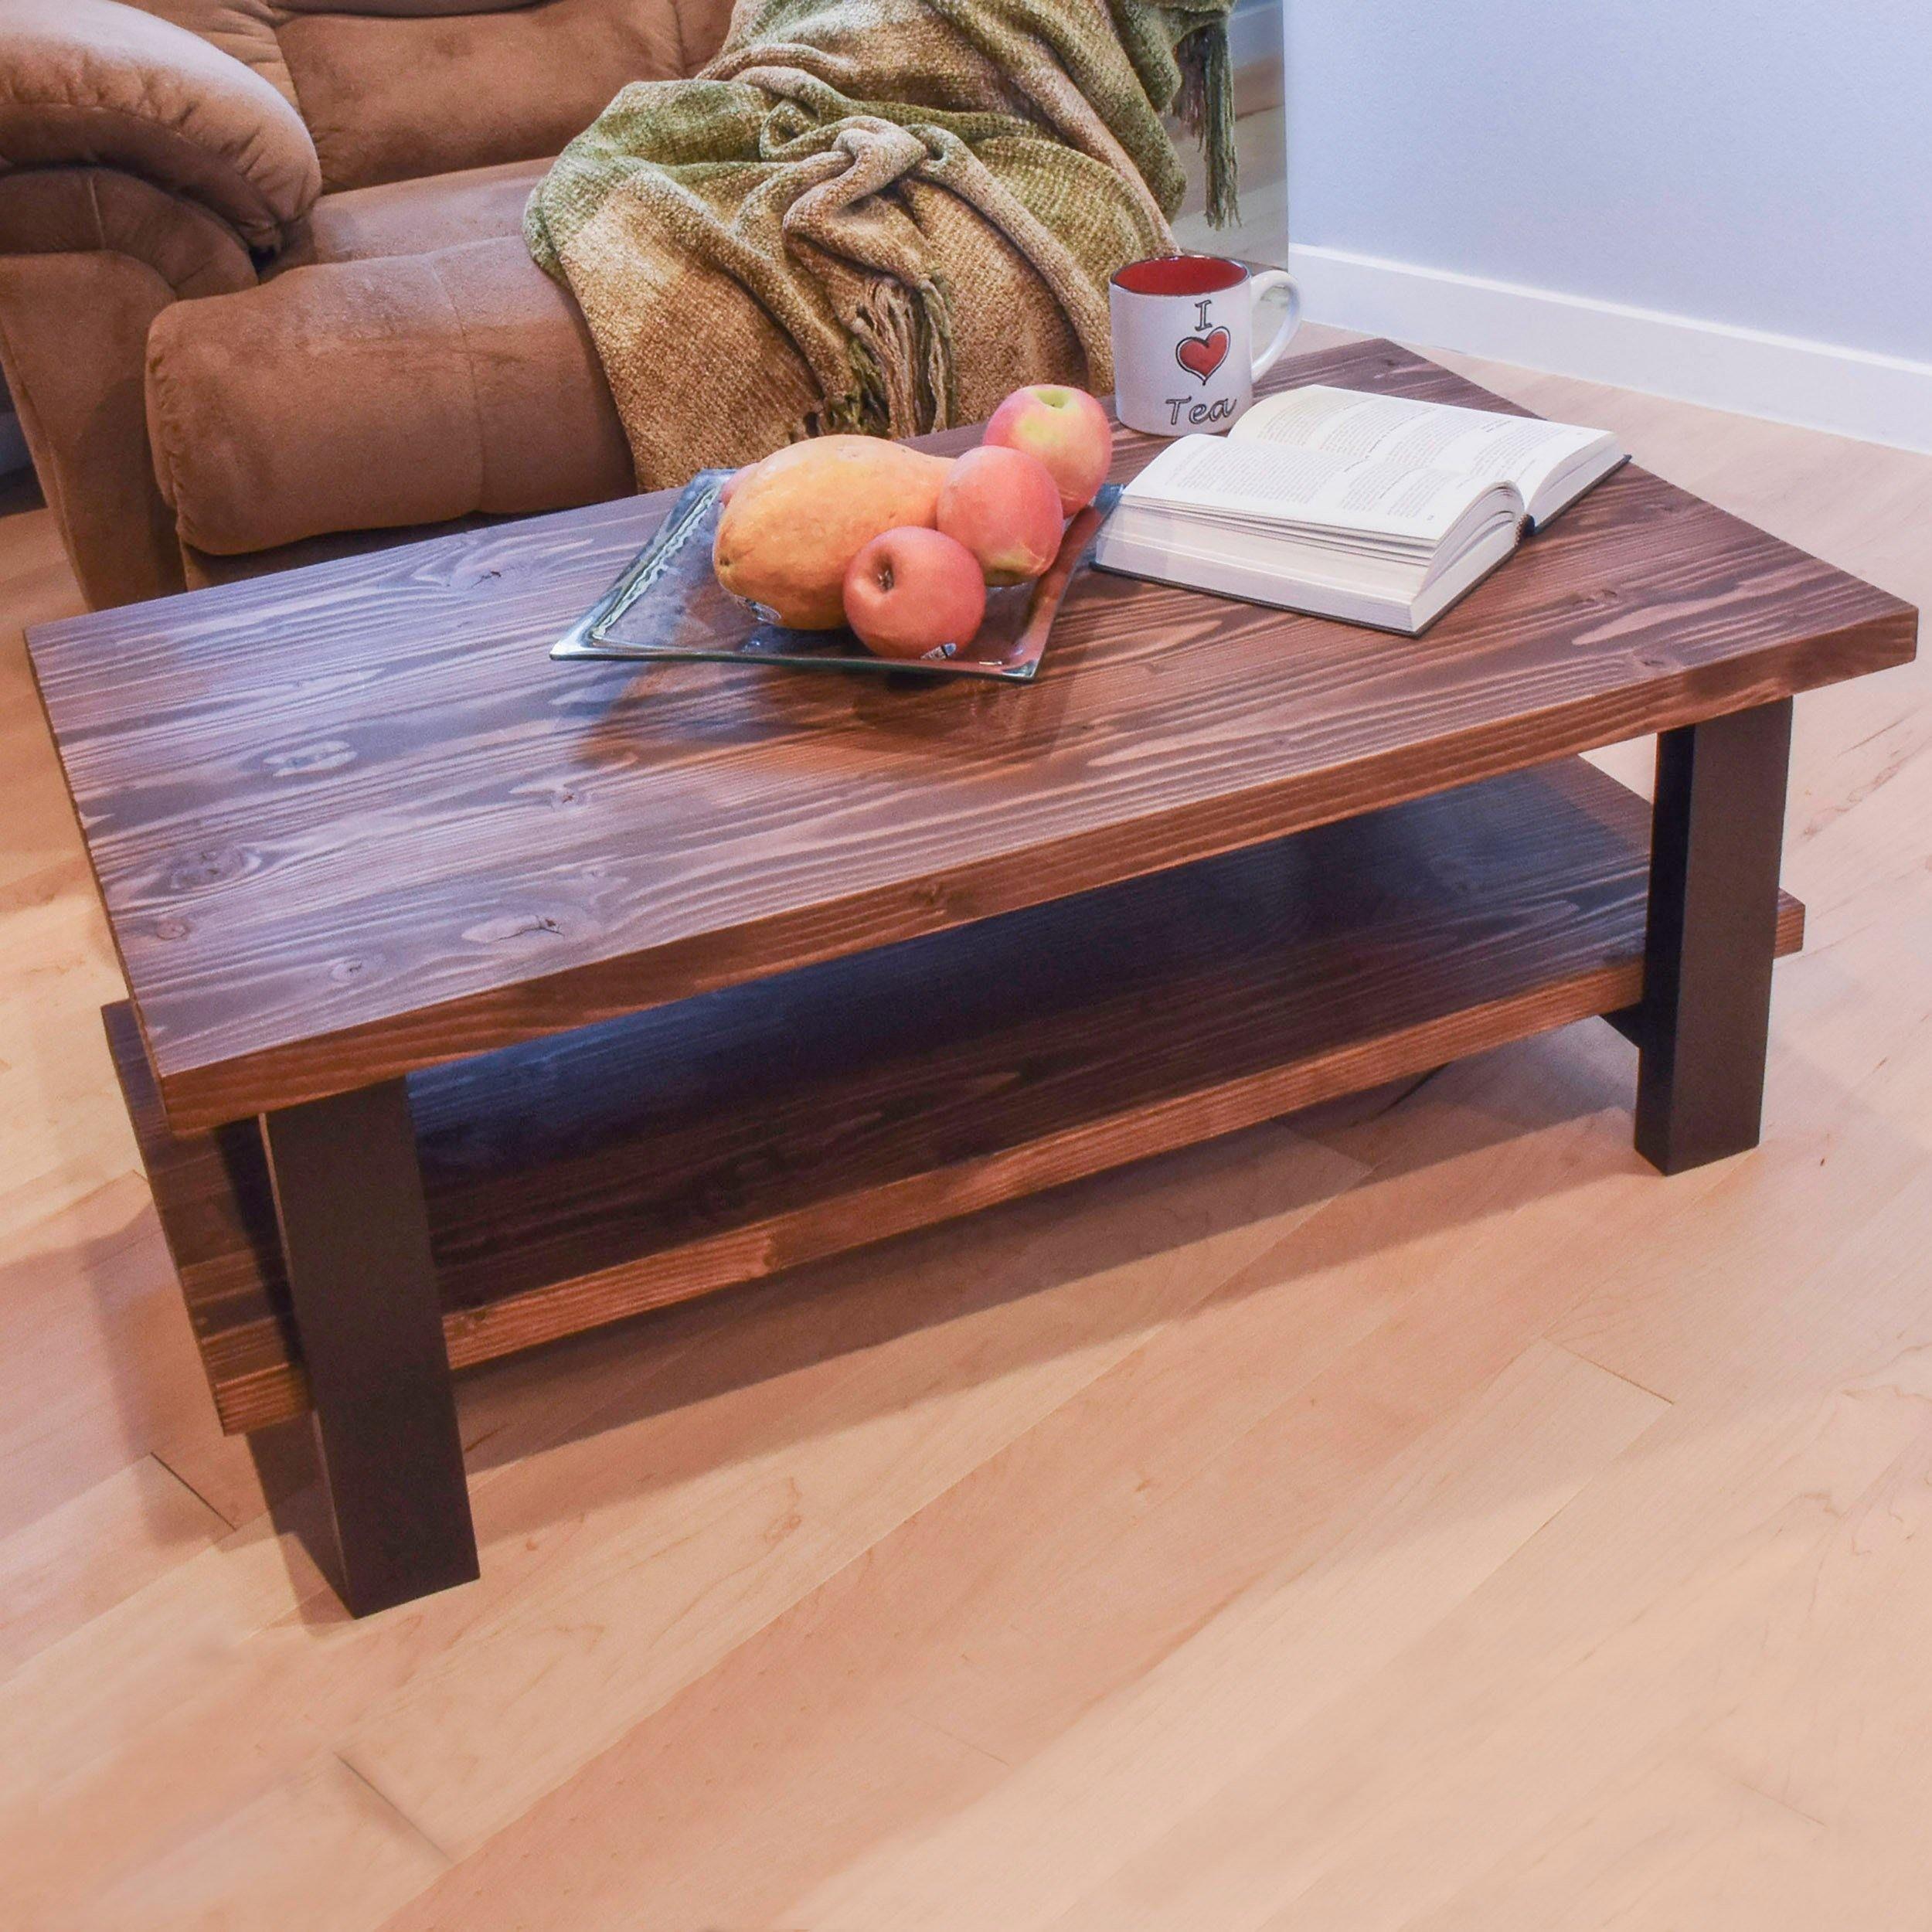 Modern Farmhouse Kent Coffee Table In 2021 Coffee Table Solid Wood Coffee Table Coffee Table Wood [ 2500 x 2500 Pixel ]